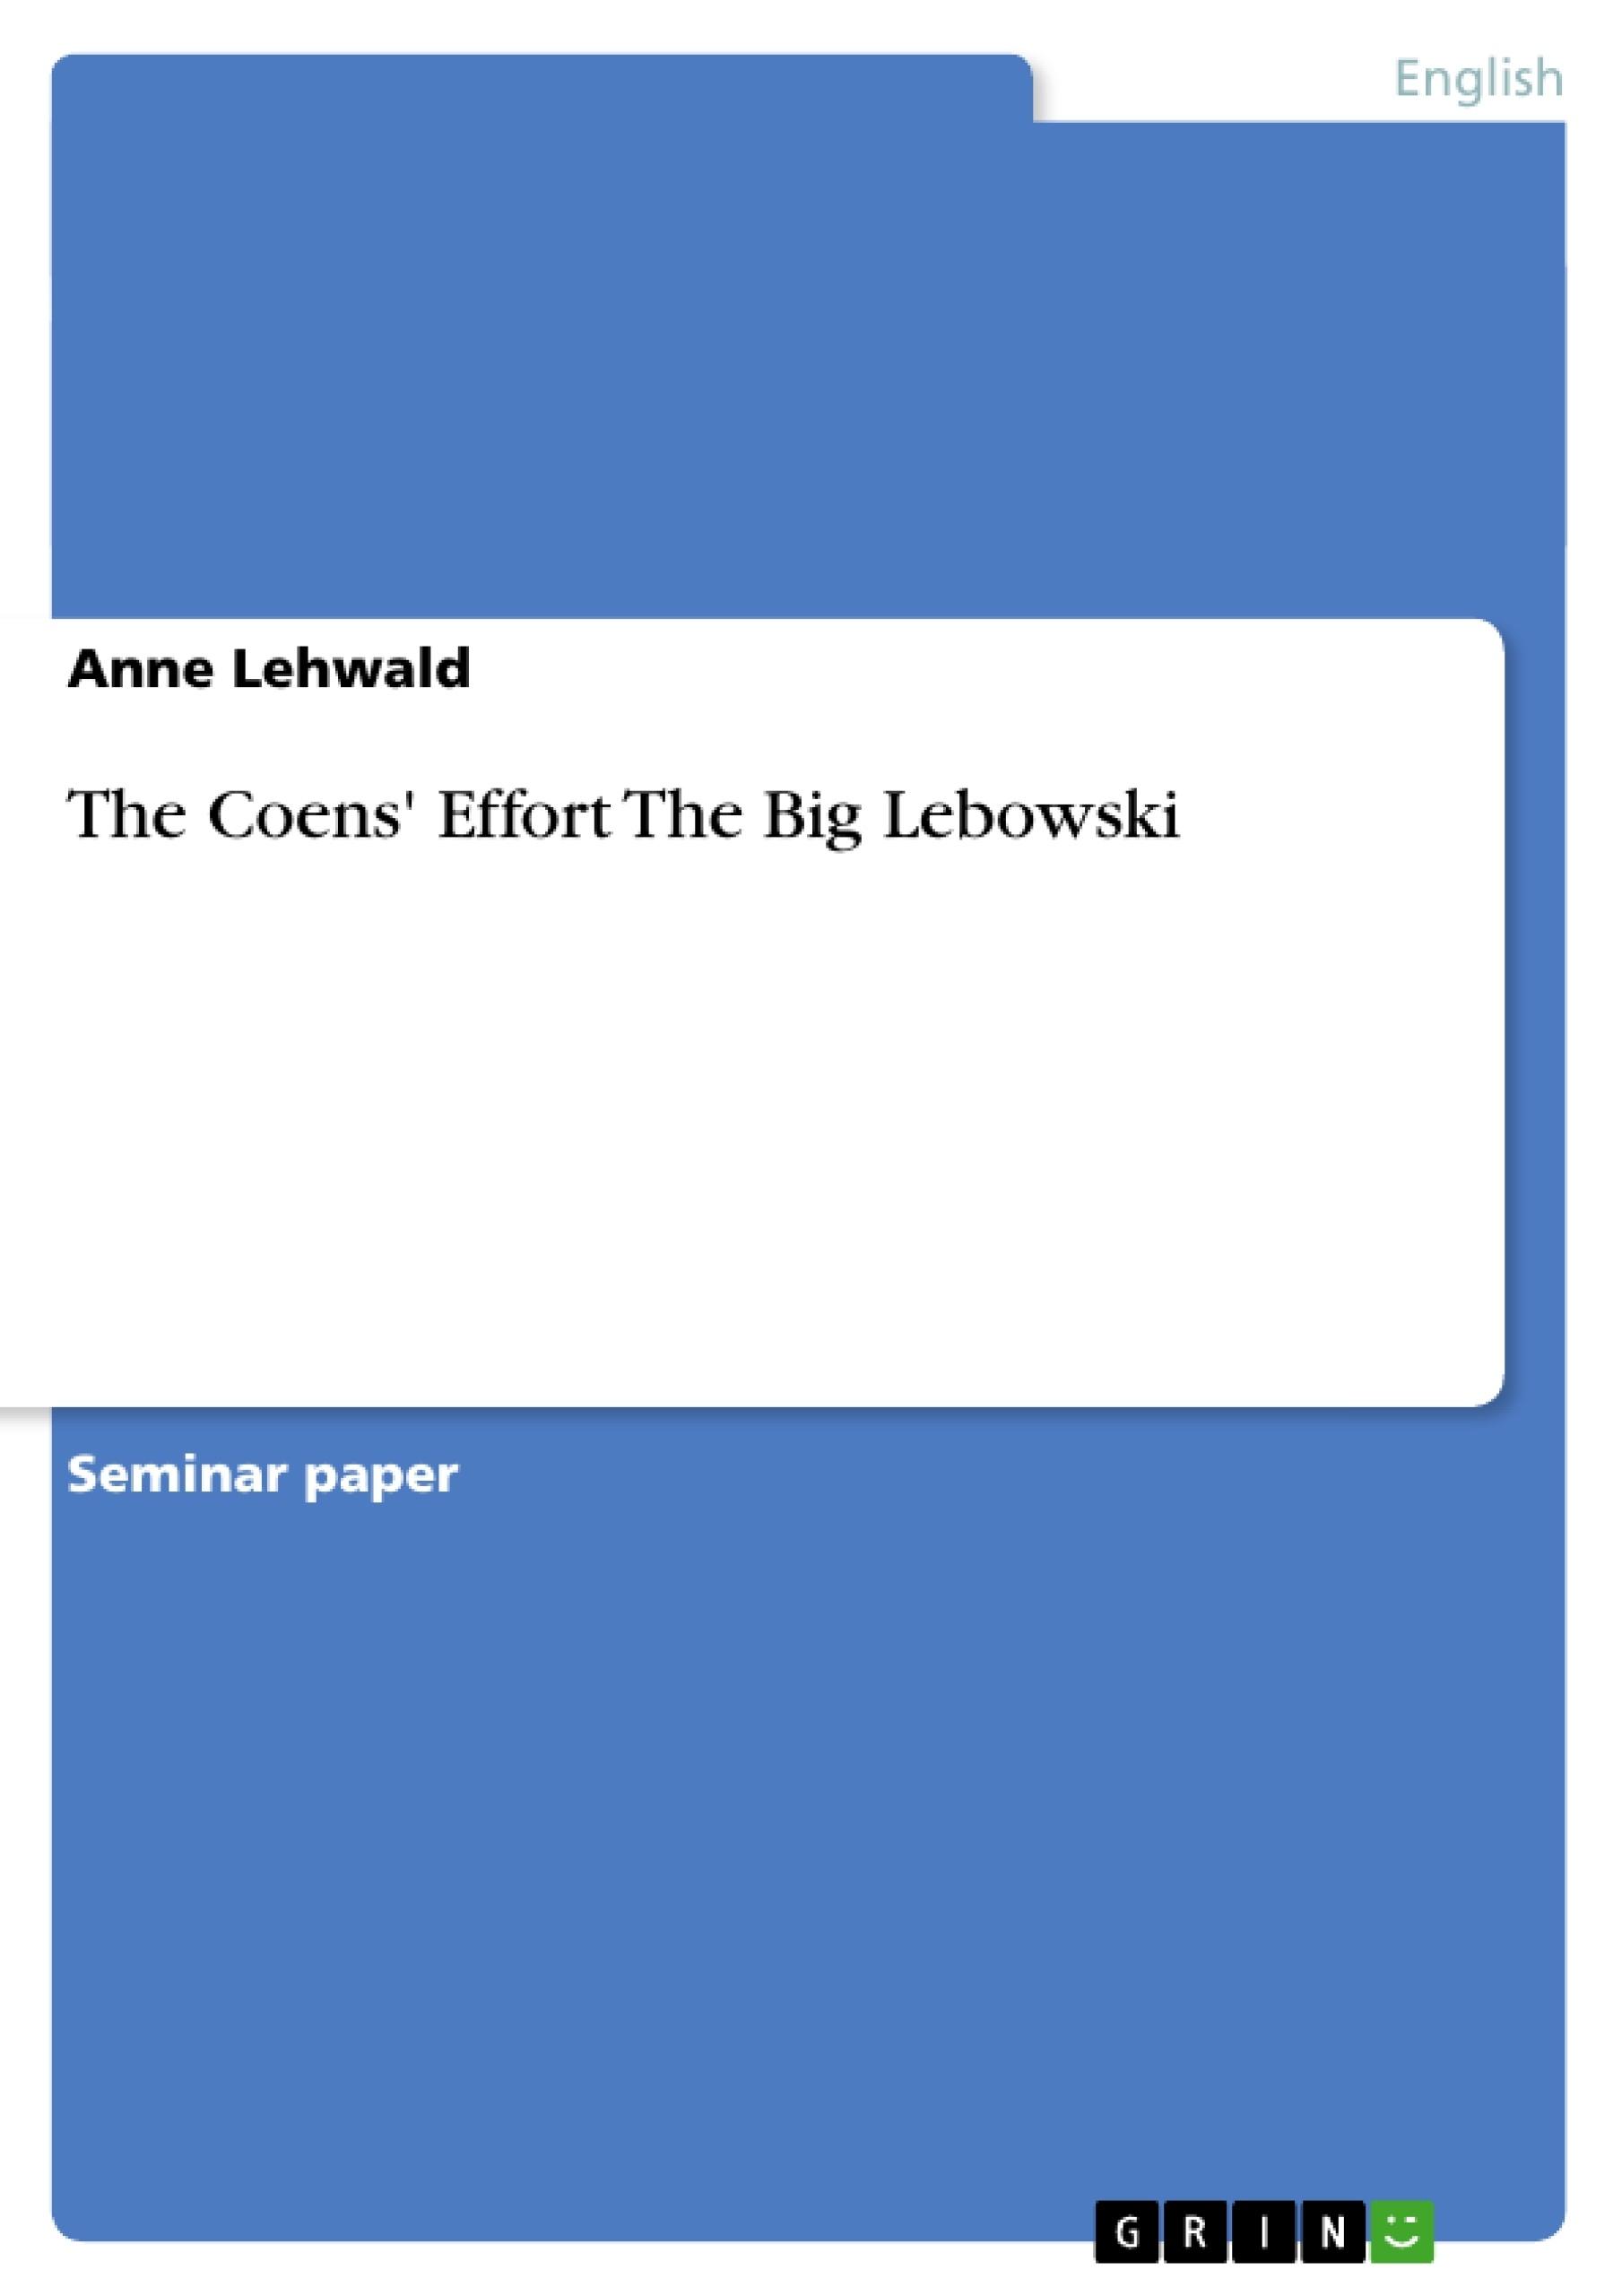 Title: The Coens' Effort The Big Lebowski